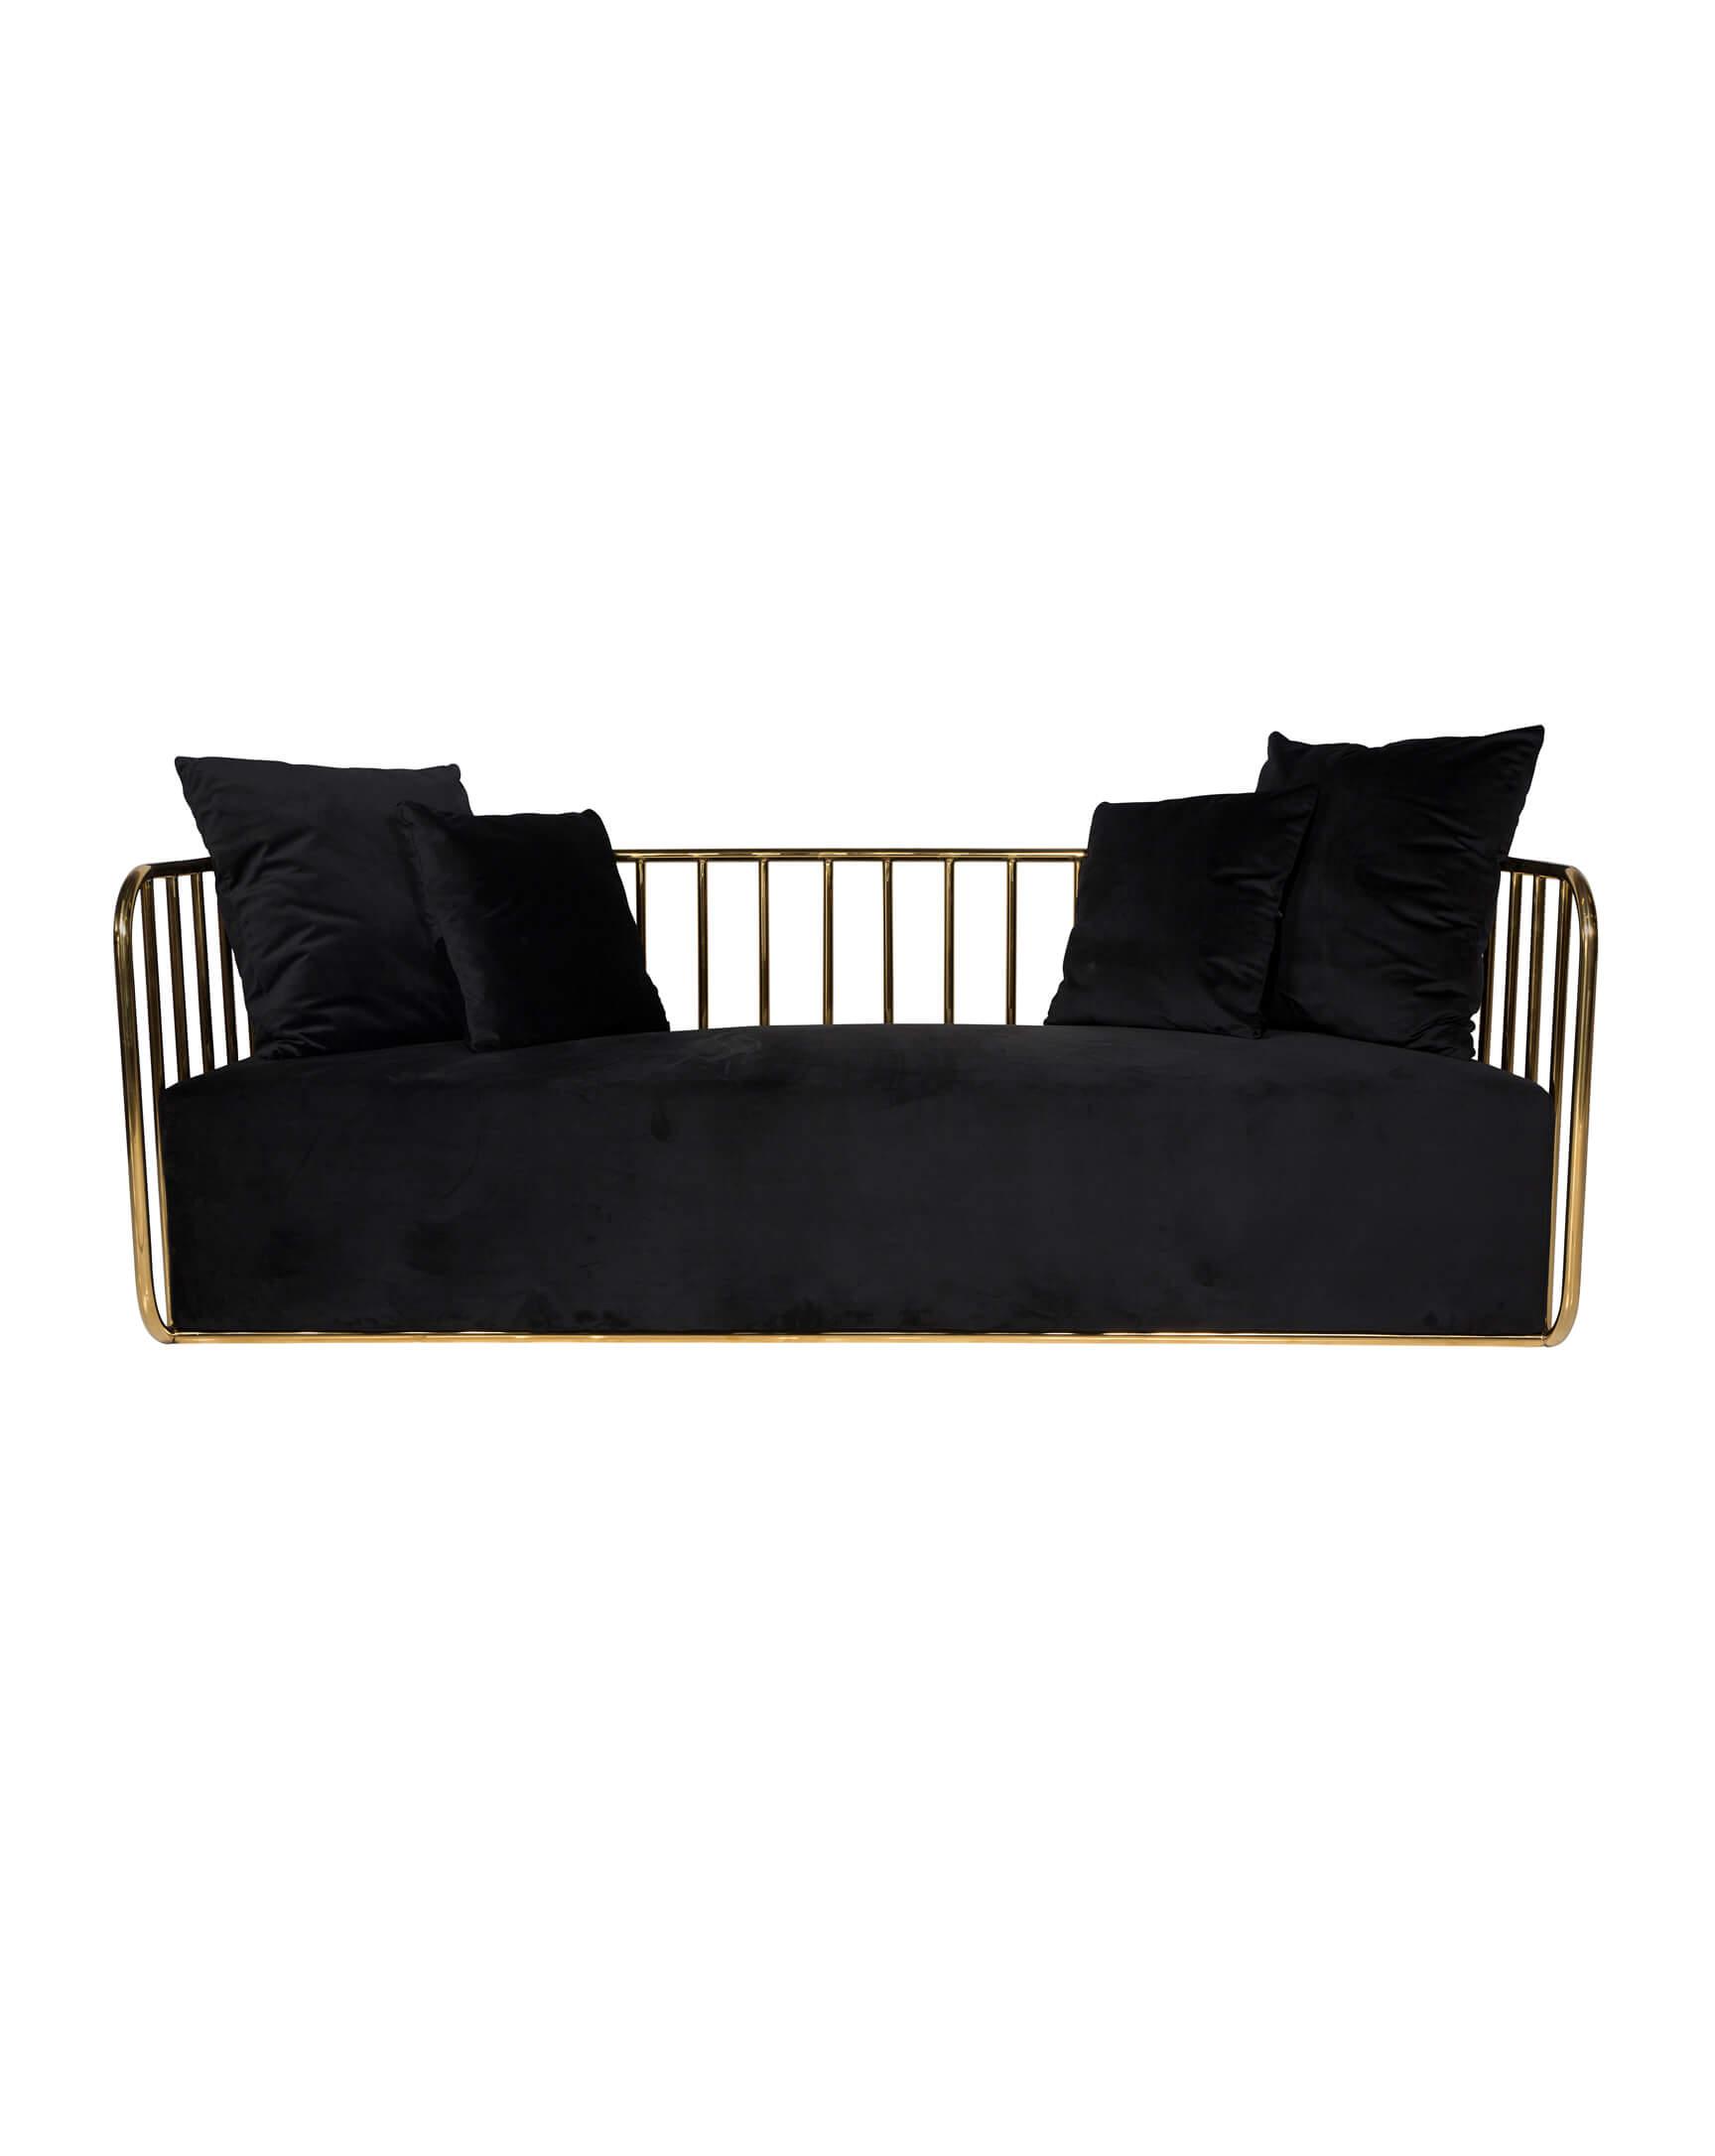 Phenomenal Black Gold Calle Ocho Sofa Carolinas Luxury Event Rentals Beatyapartments Chair Design Images Beatyapartmentscom